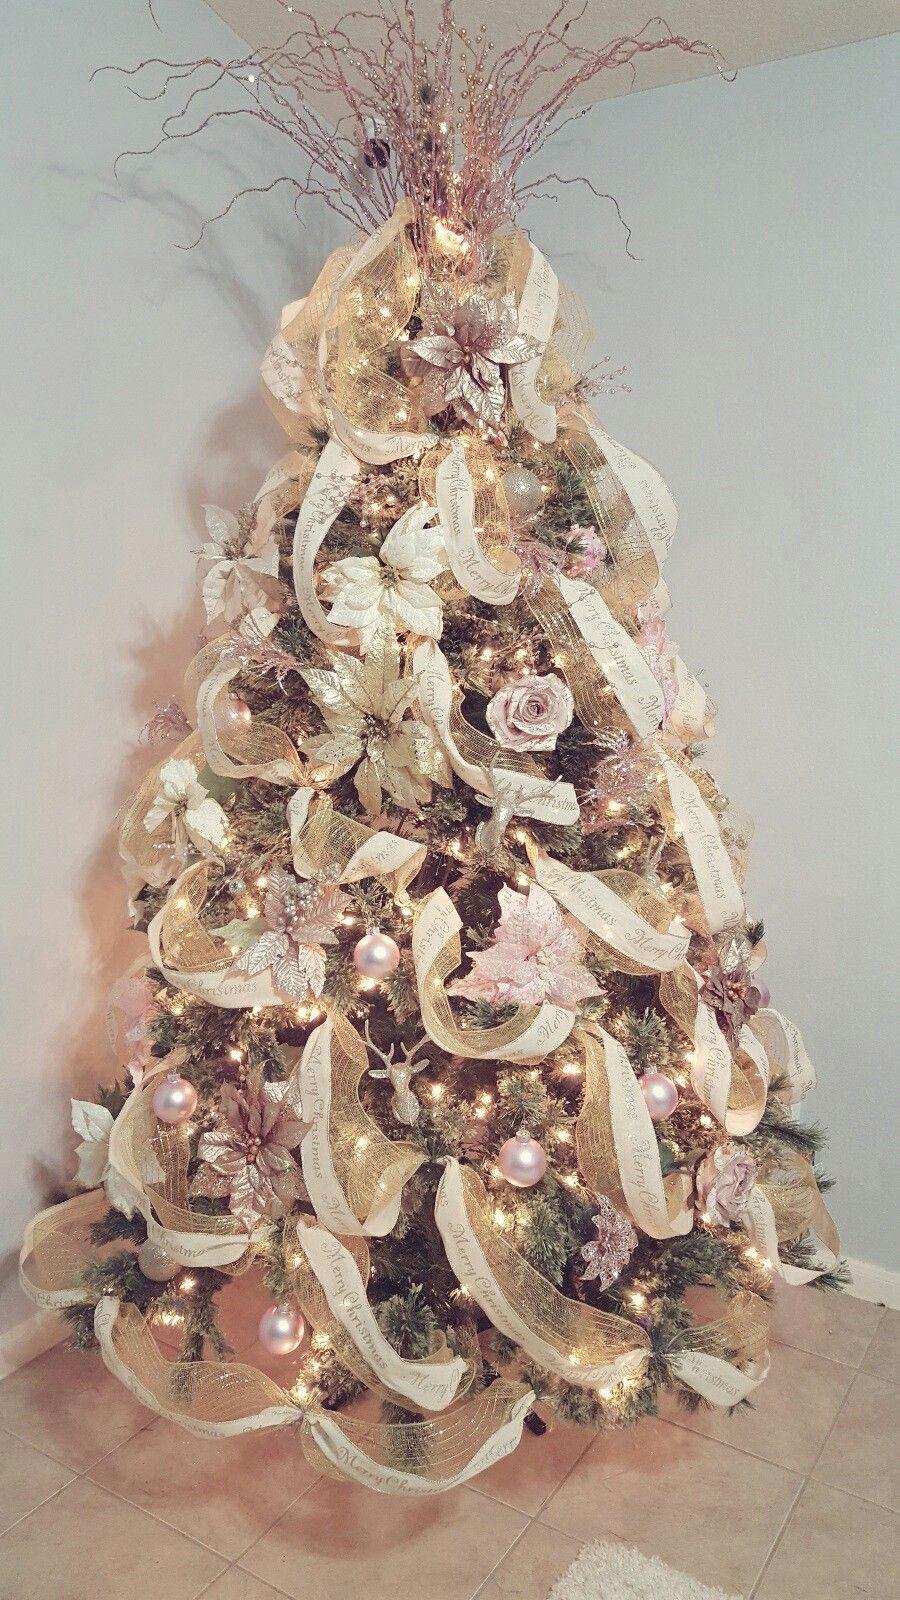 Rose gold Christmas tree | Home decor/ organize | Pinterest | Rose gold christmas tree, Gold ...